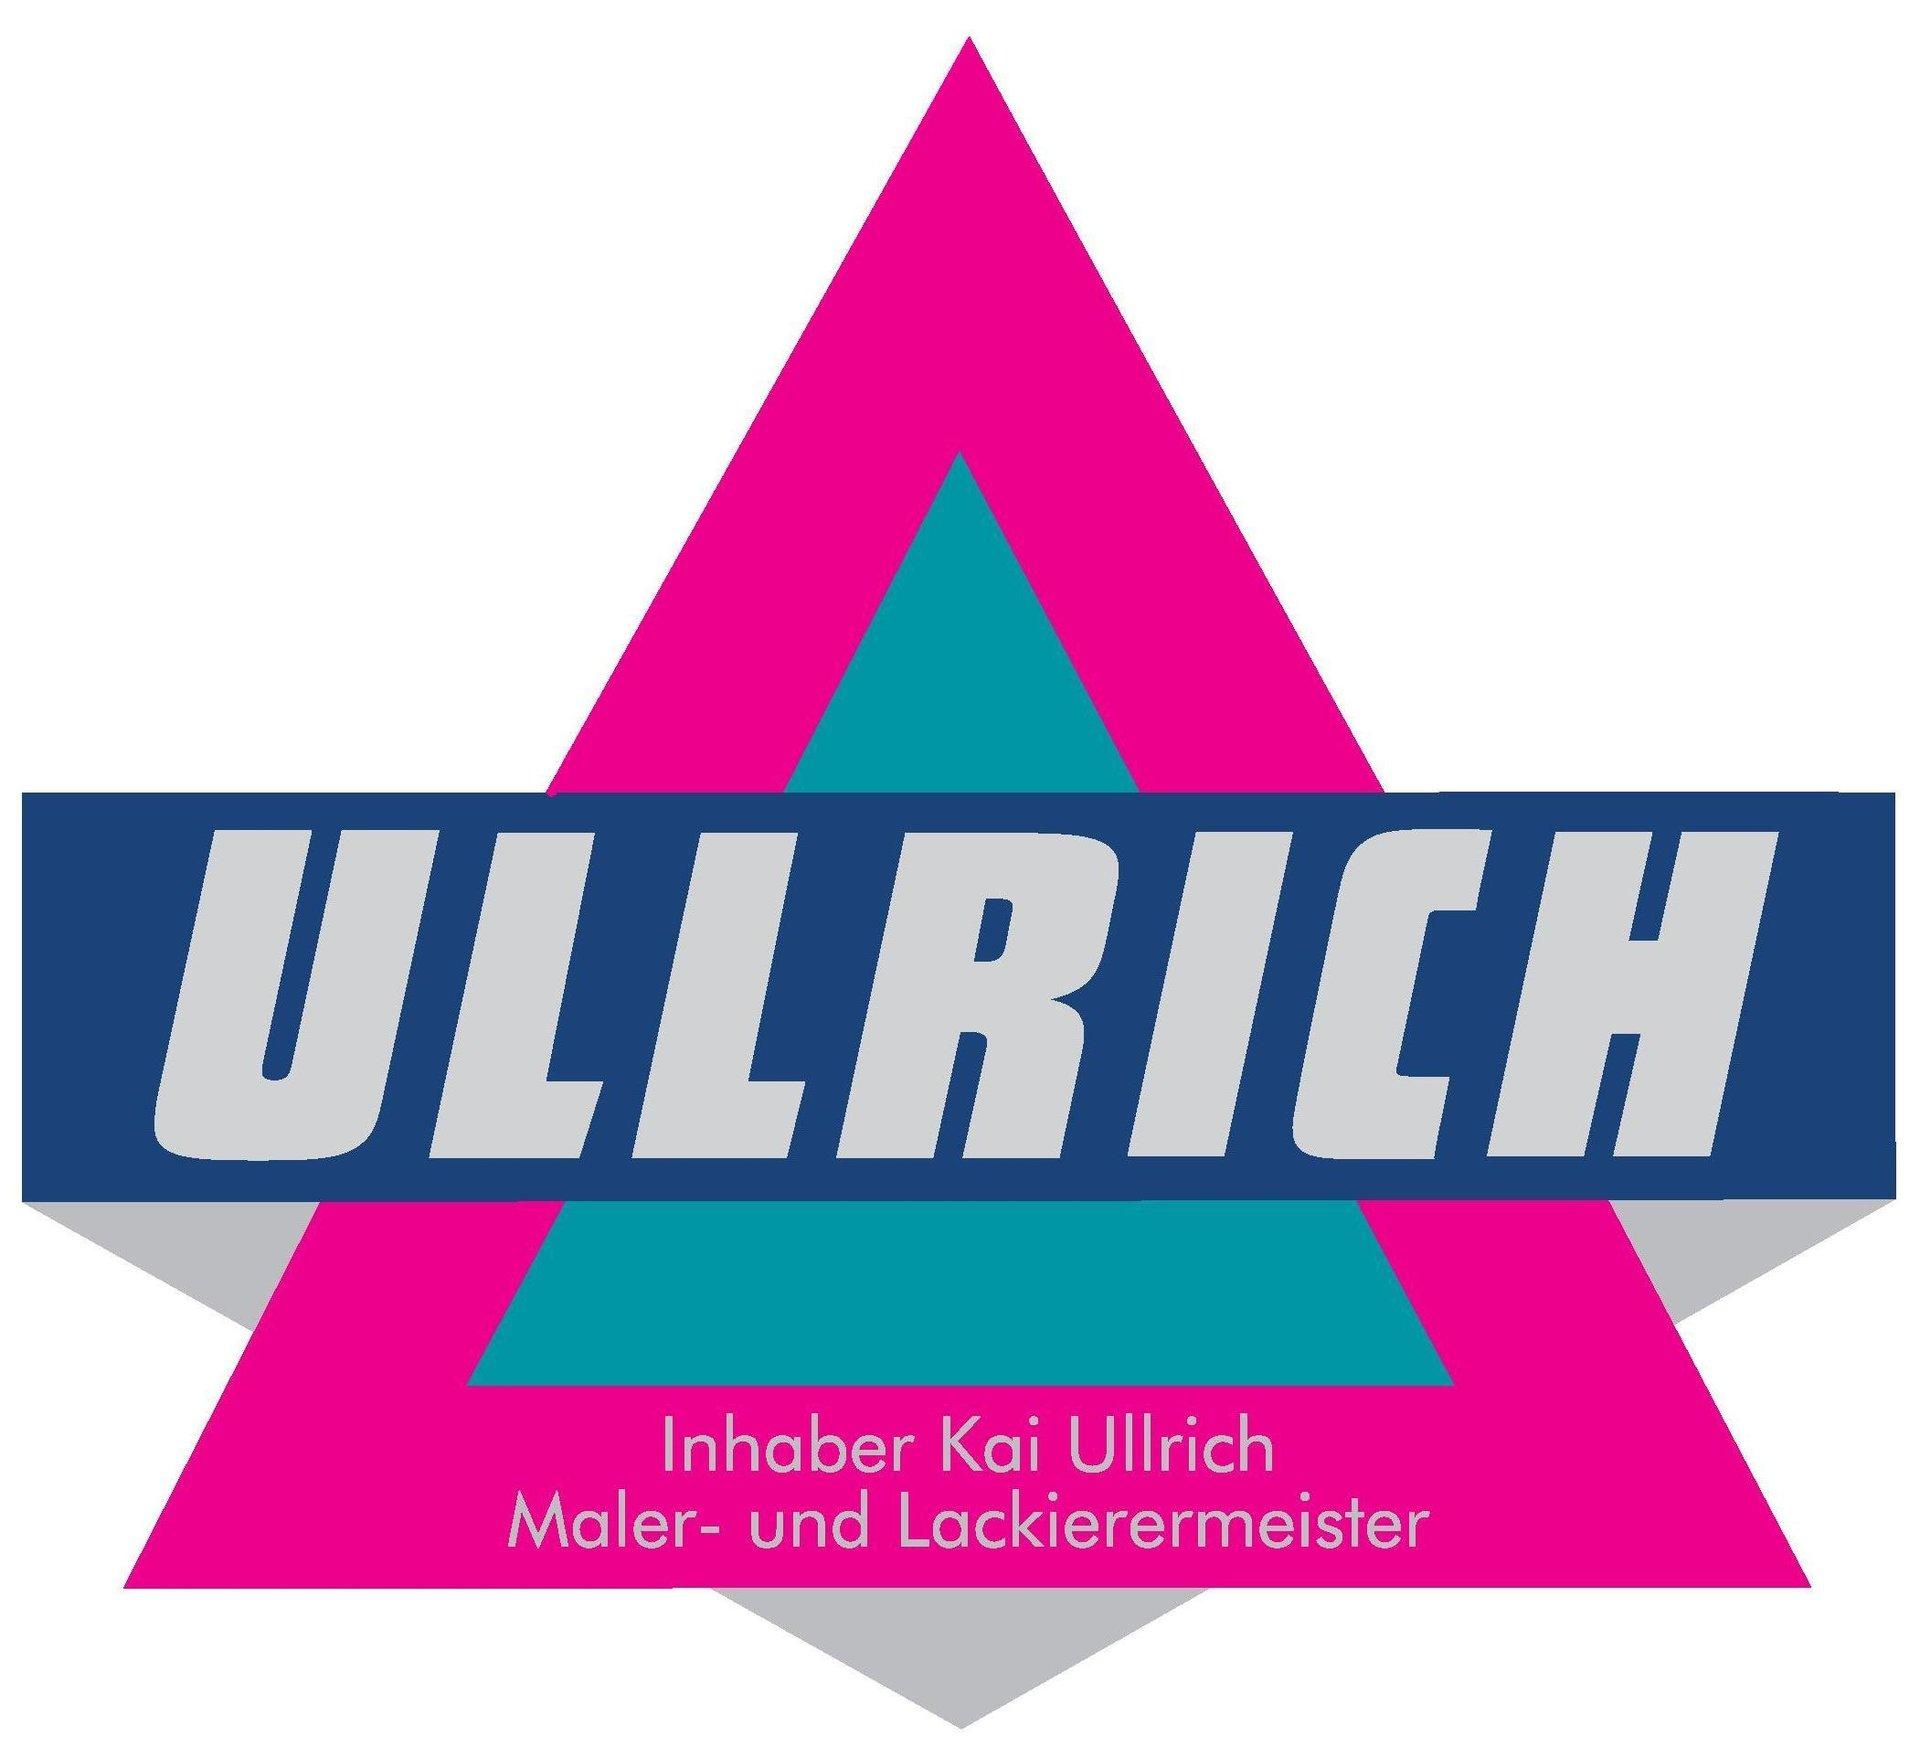 Maler- und Lackiererbetrieb Kai Ullrich GmbH